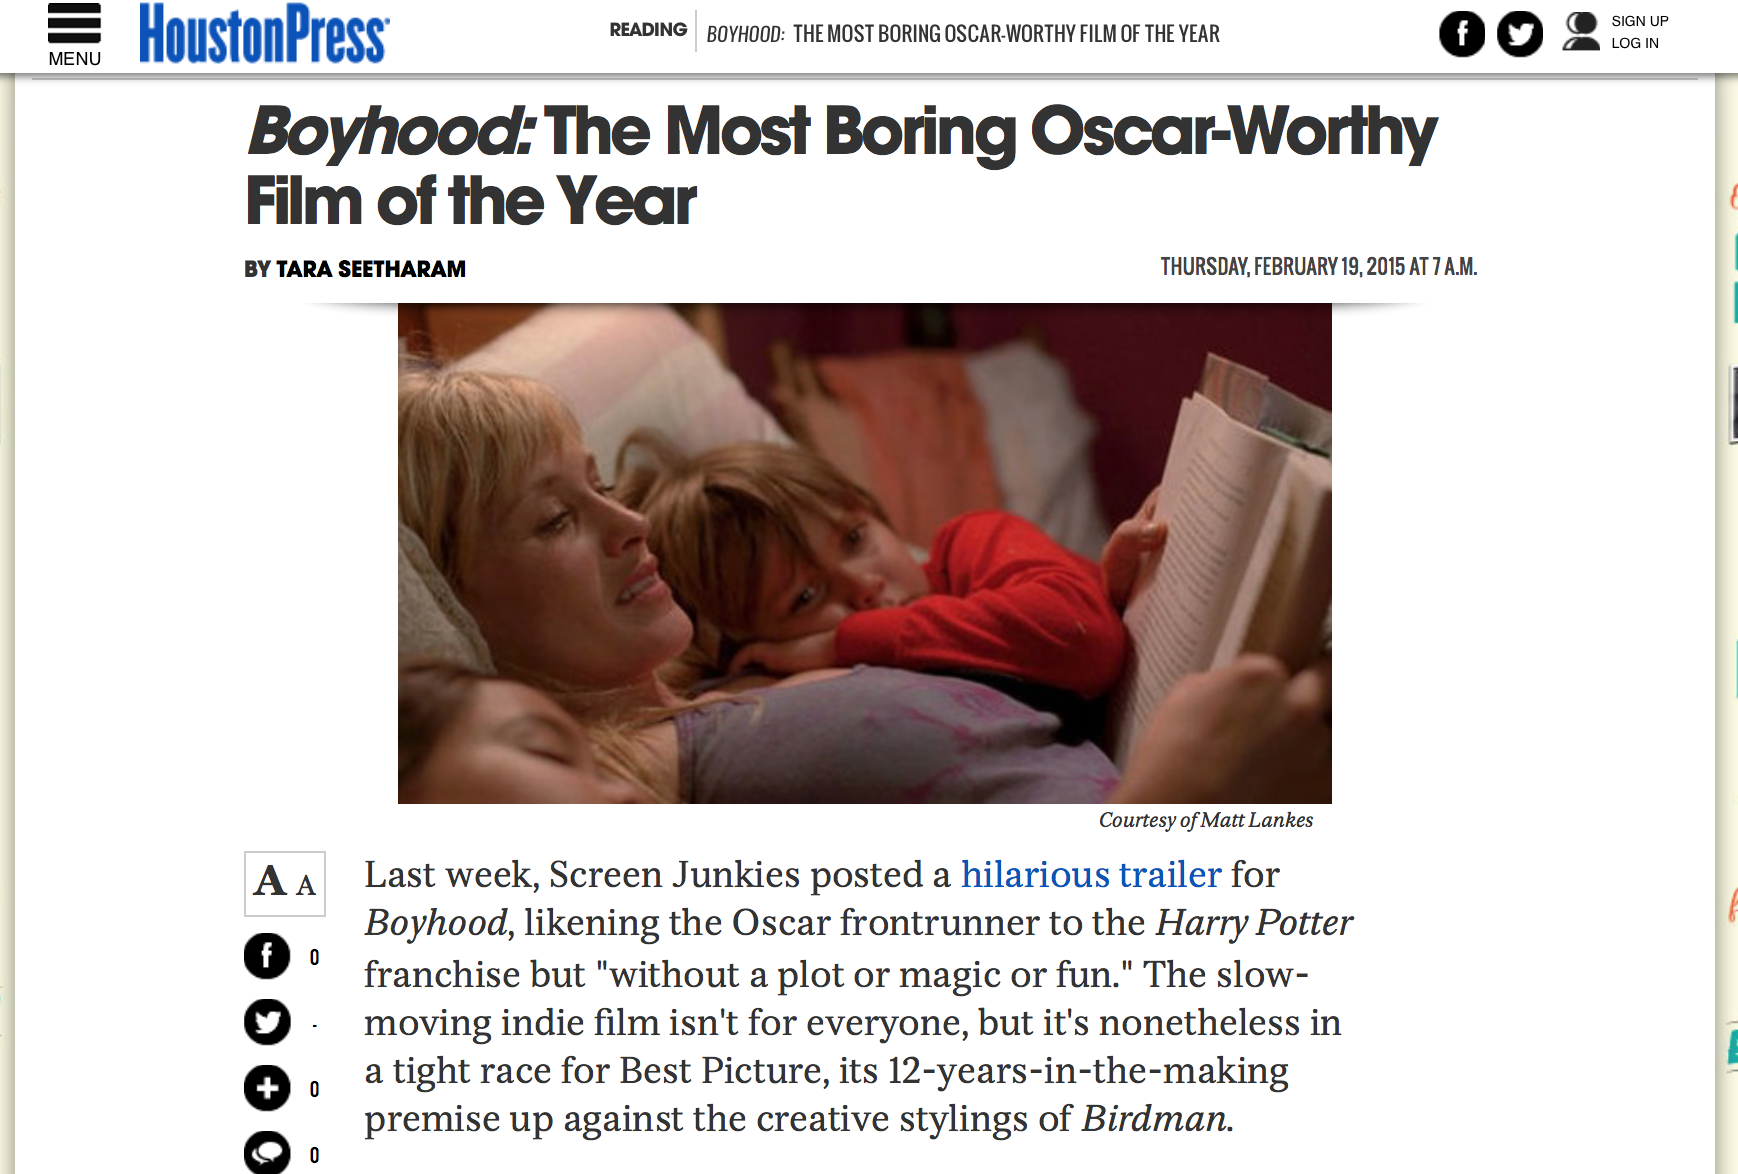 """Boyhood"": The most boring Oscar-worthy film of the year  Houston Press - February 19, 2015"